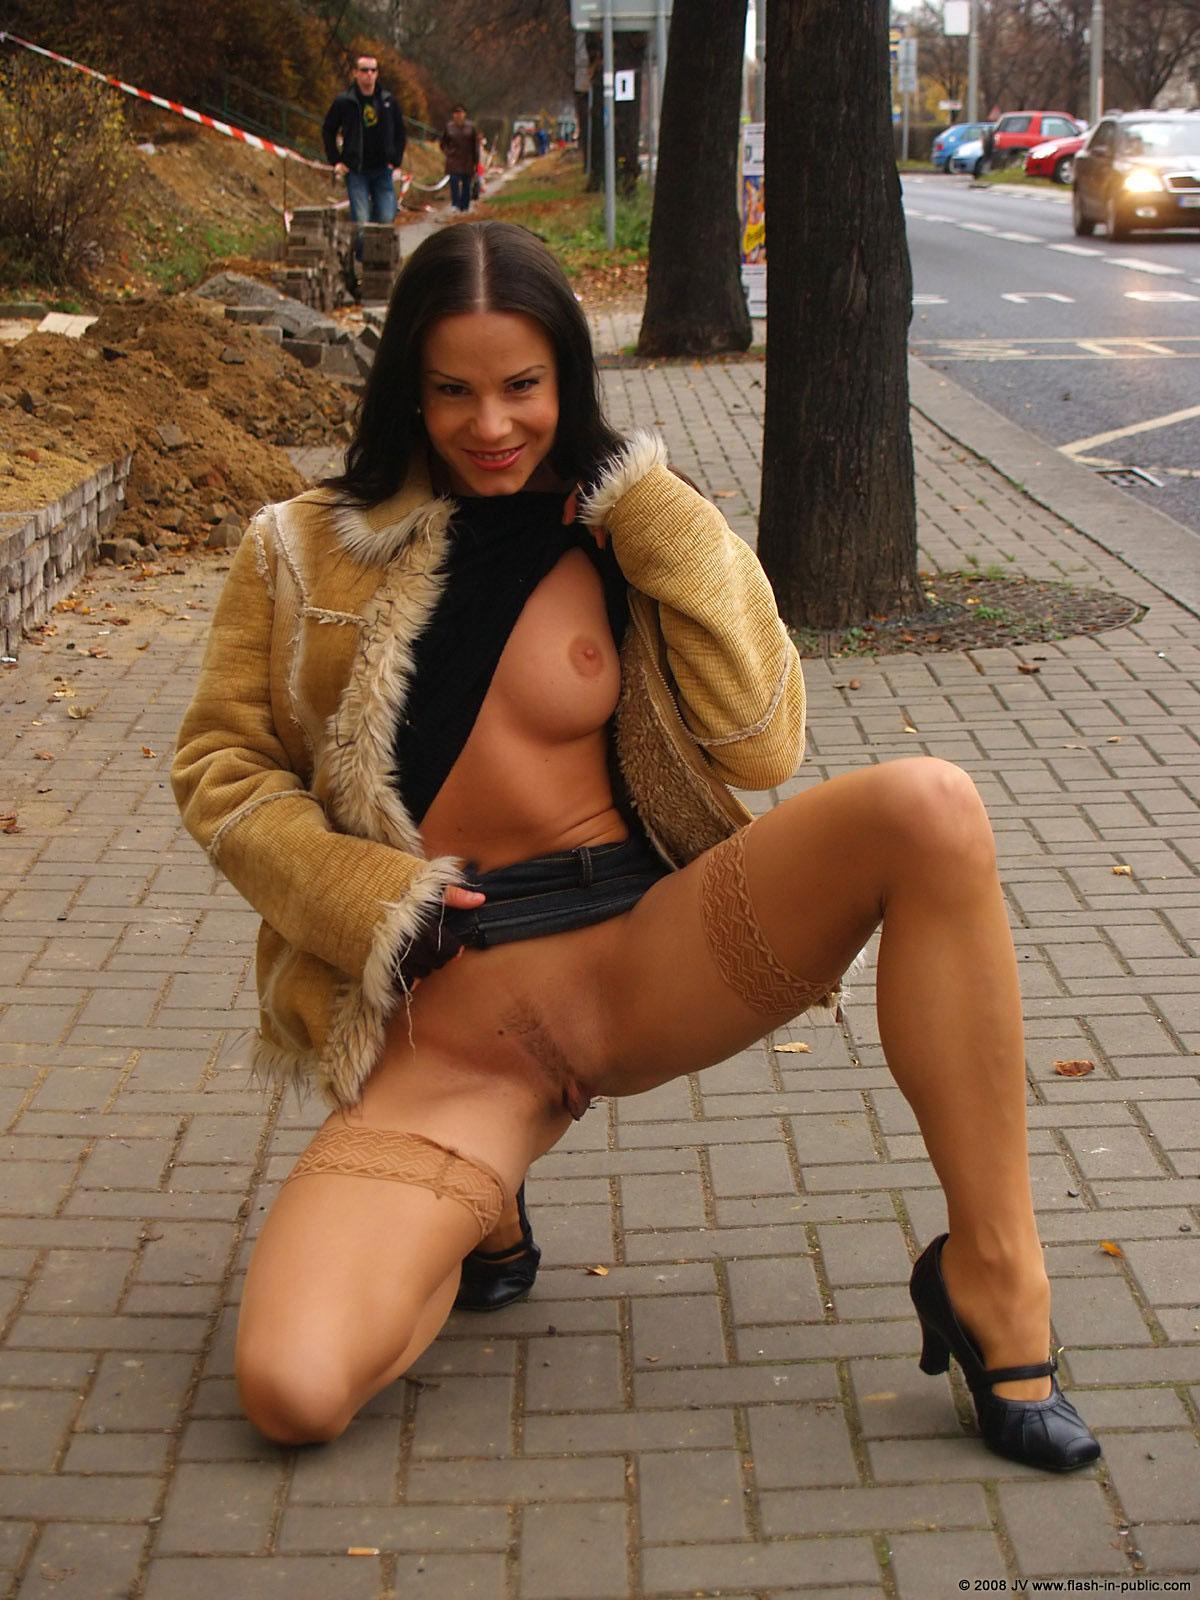 alexandra-g-bottomless-stockings-flash-in-public-10